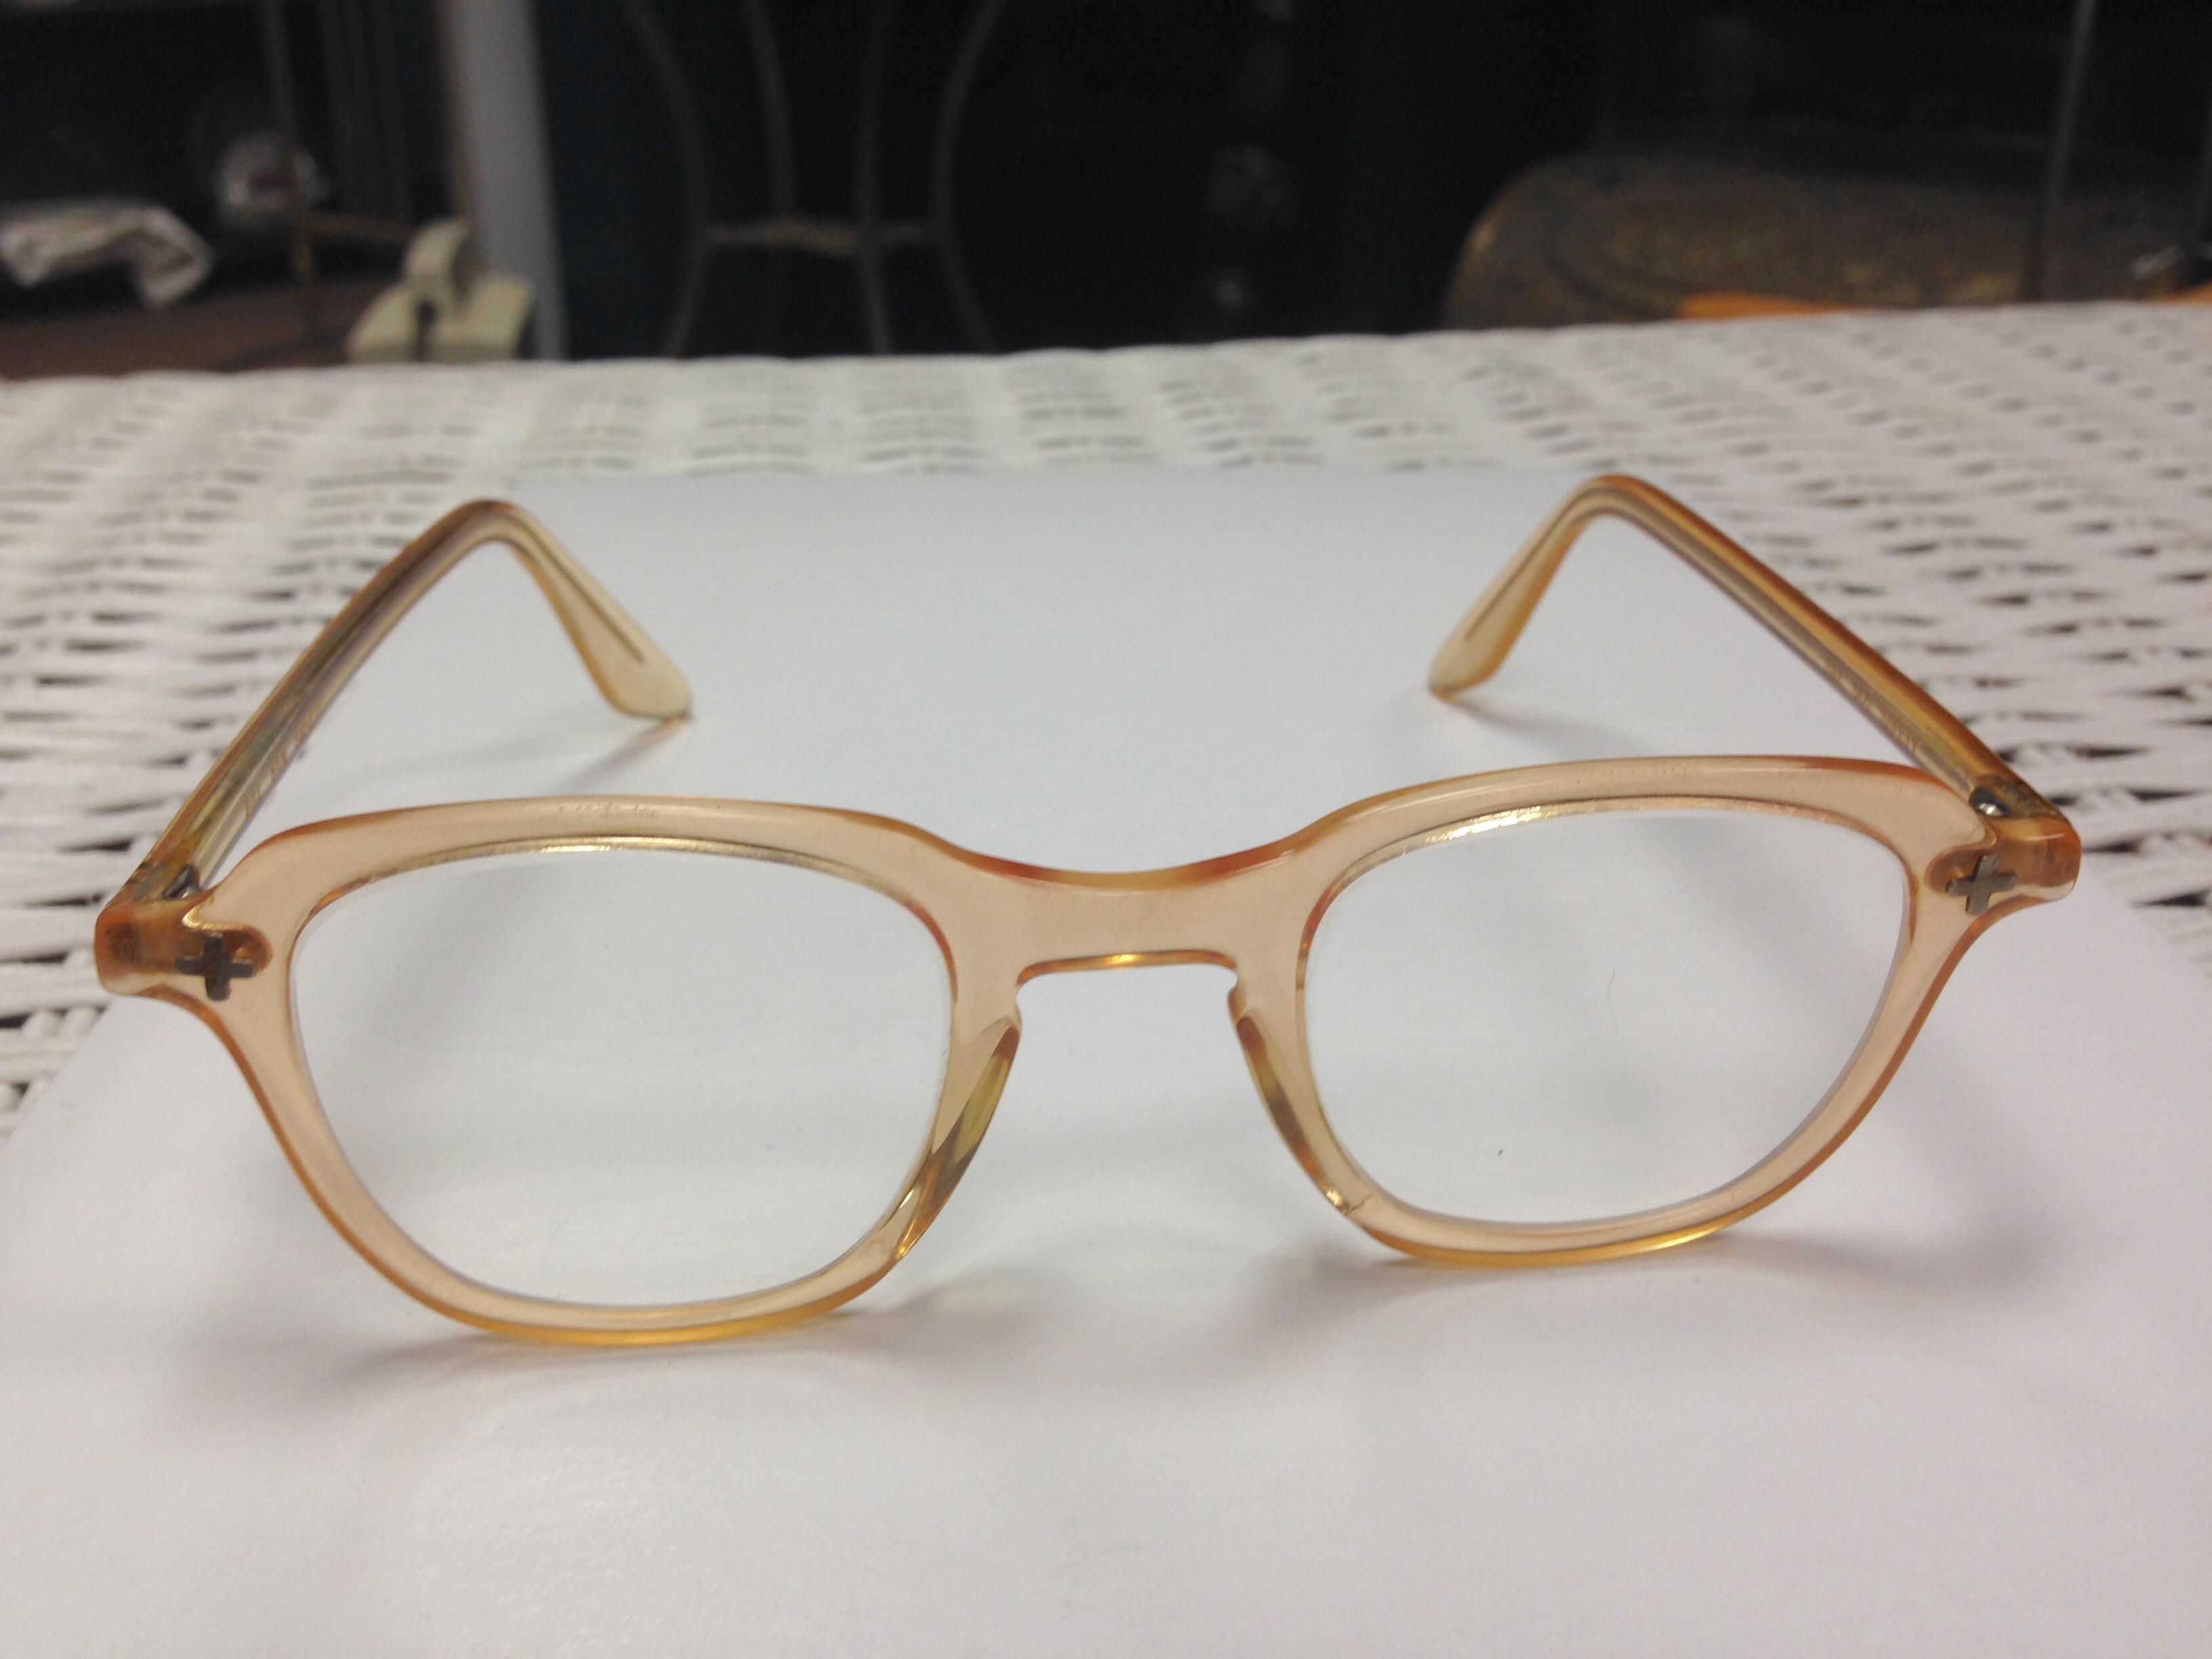 Rare Antique B&L Safety Glasses